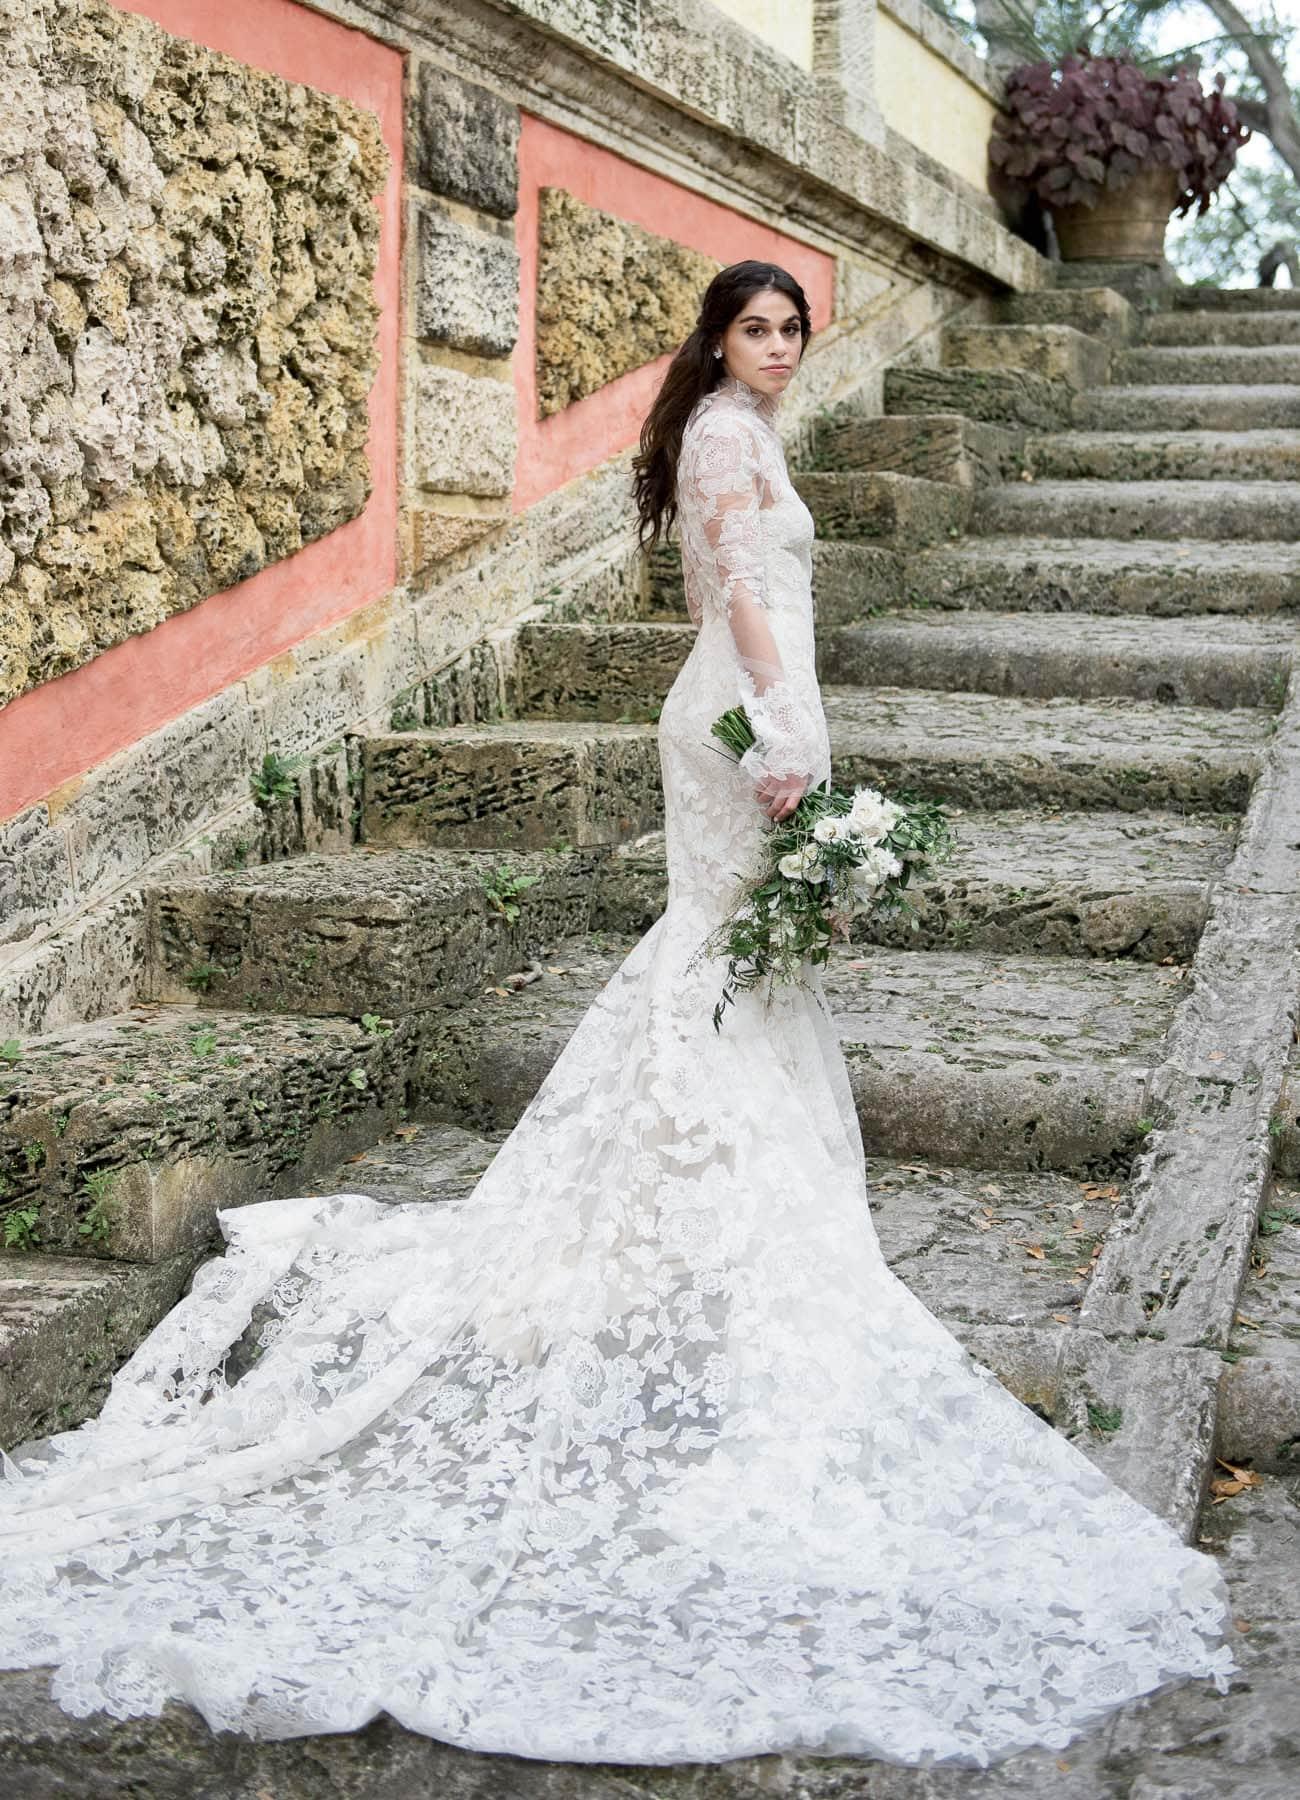 01-vizcaya-museum-wedding-photography-4.jpg